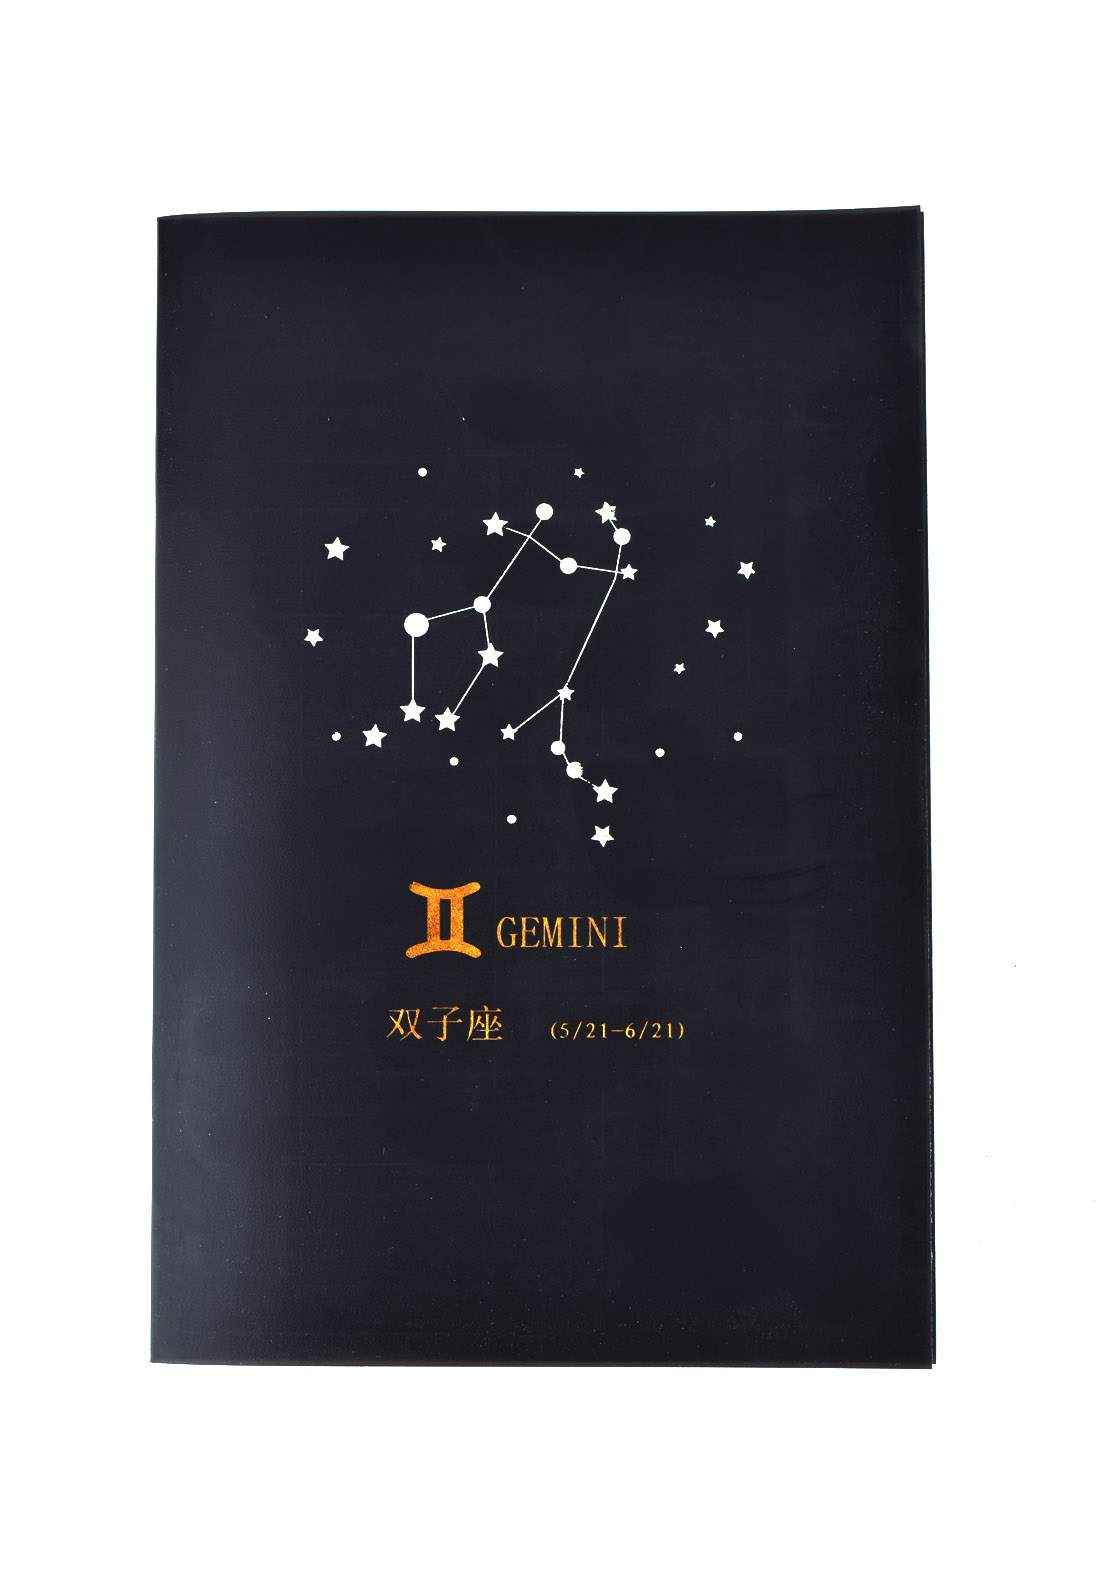 Small Black Drawing Book 24 Sheets-Gemini دفتر رسم اسود صغير بطبعة برج الجوزاء